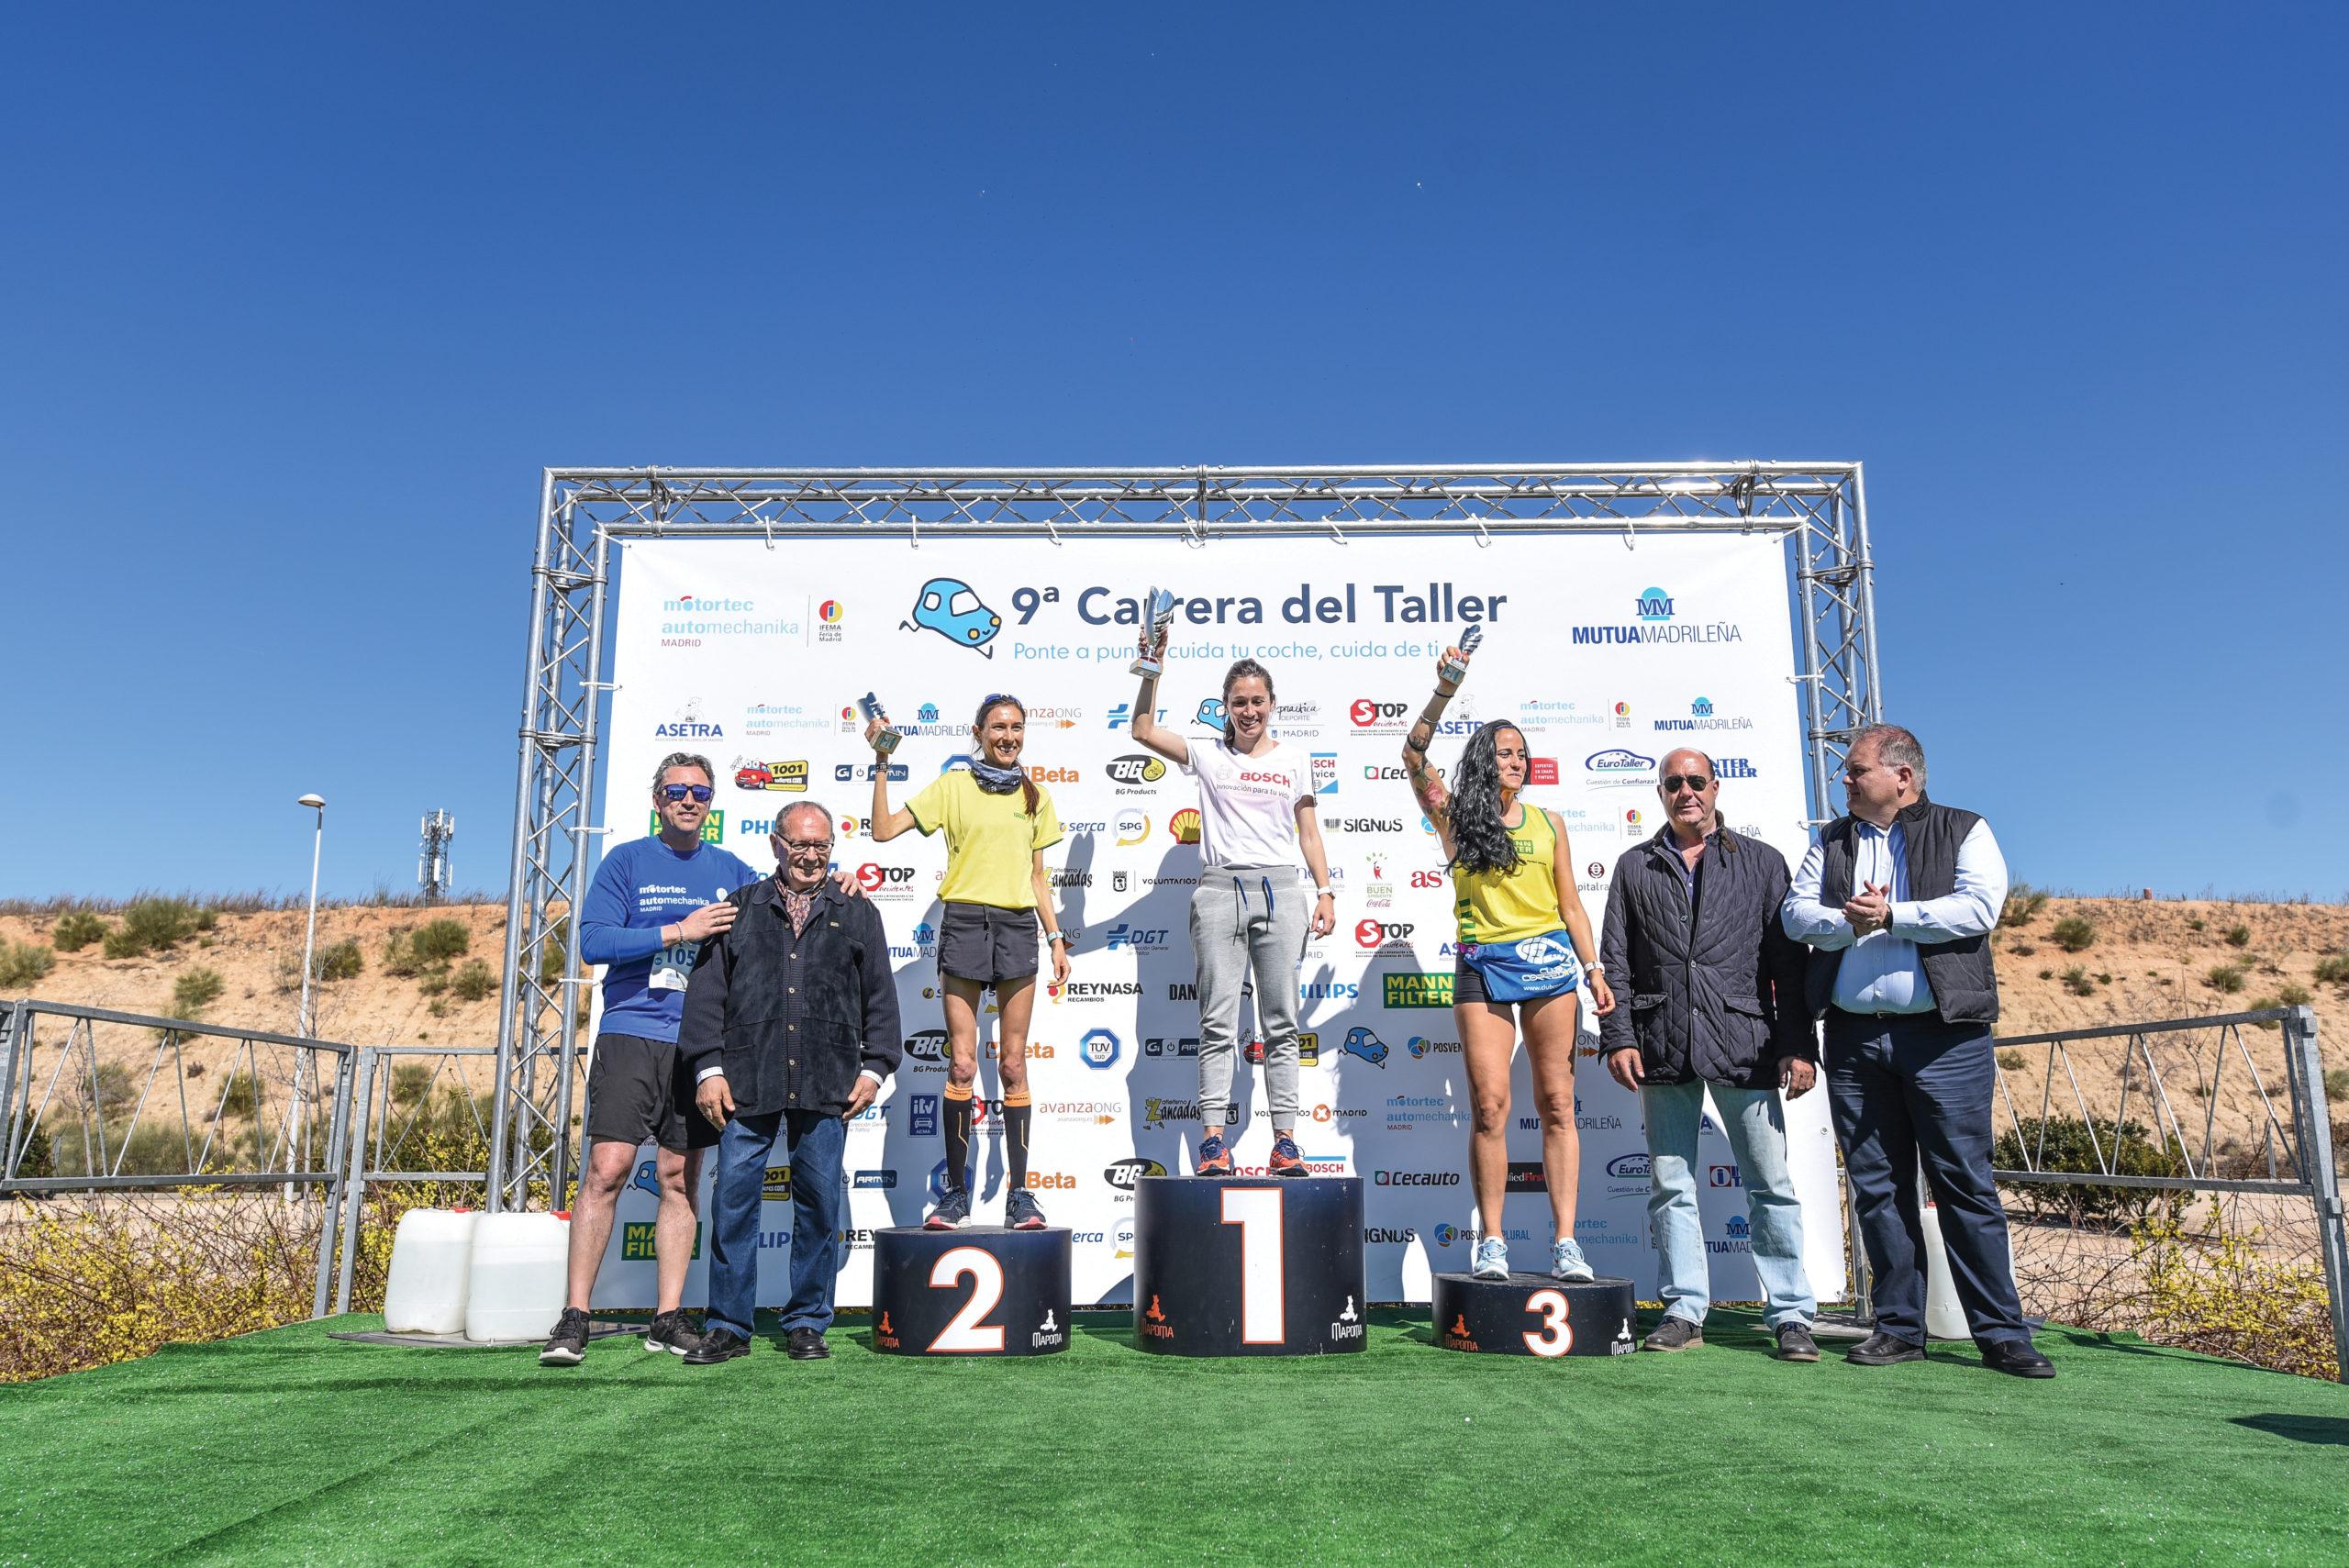 Podium 5K femenino 9aCarrera del Taller